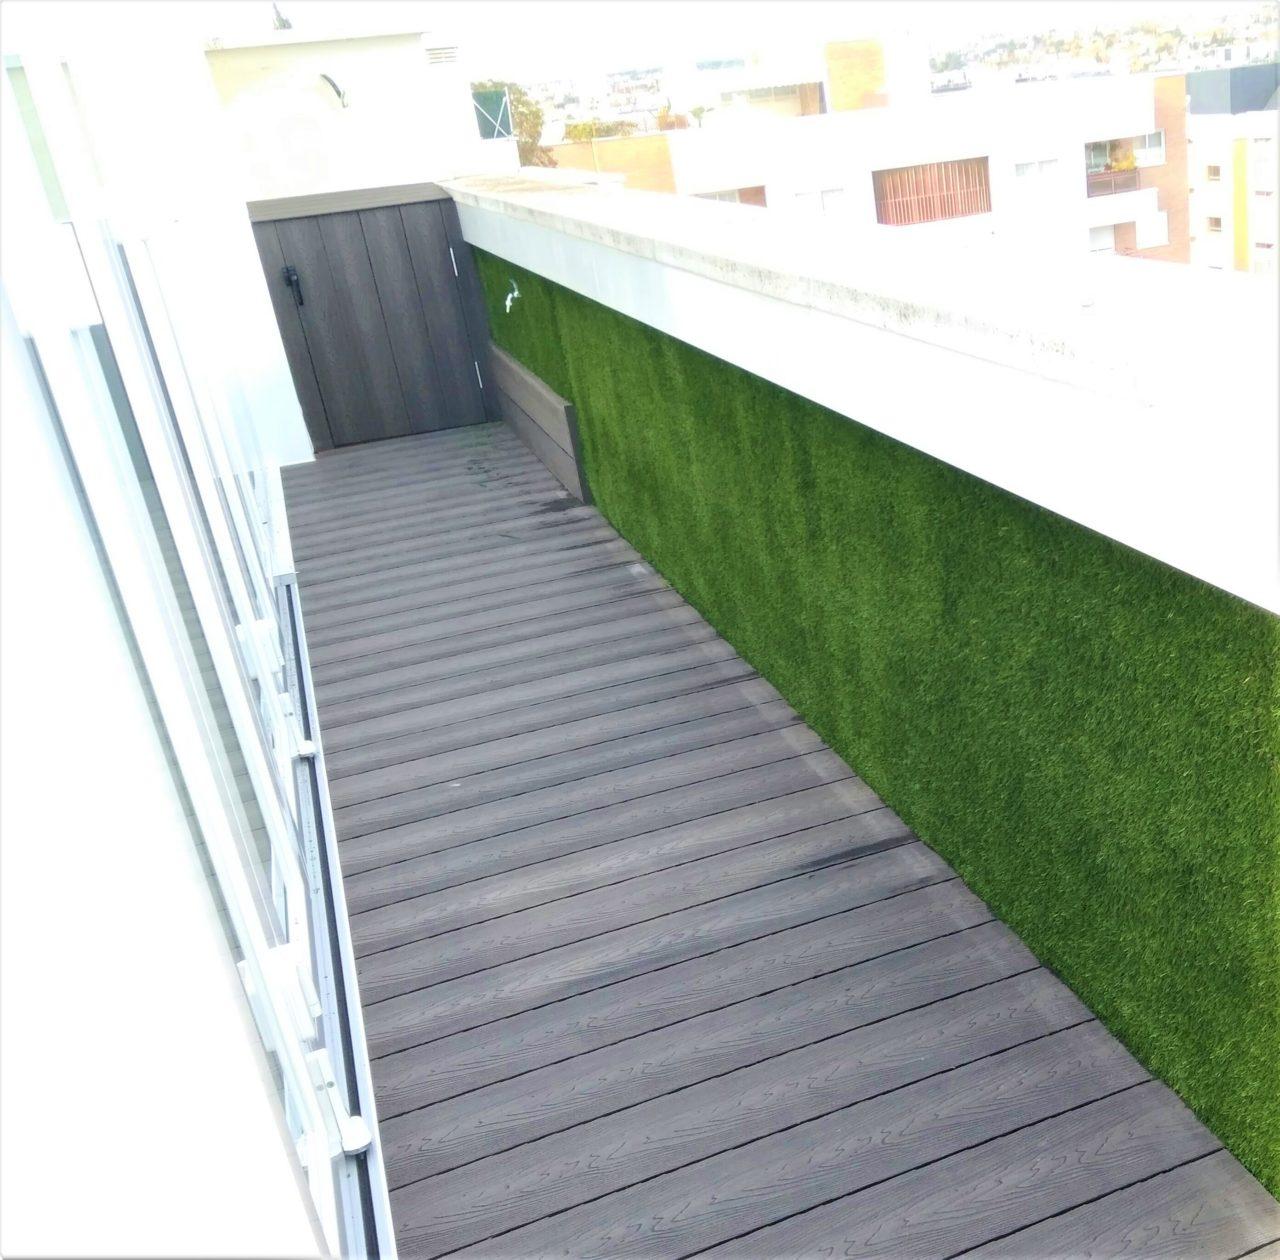 https://instaladoresdecesped.es/wp-content/uploads/2021/02/paredes1-1280x1260.jpg